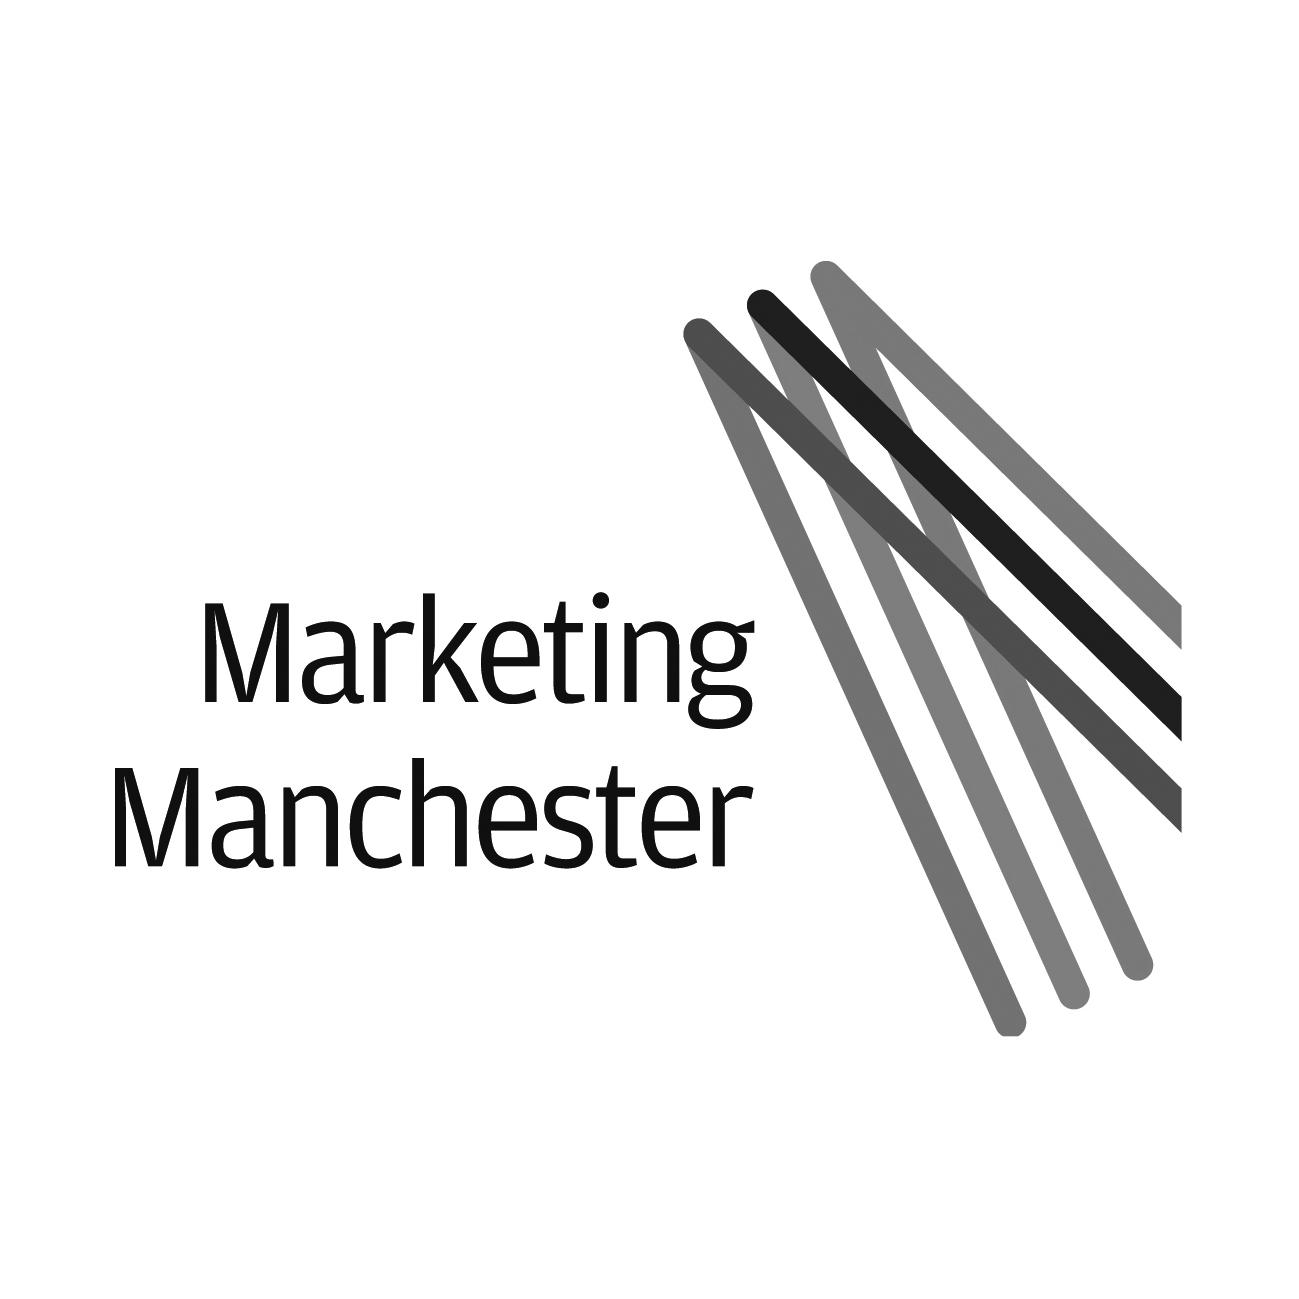 marketing-manchester-logo_mono.jpg